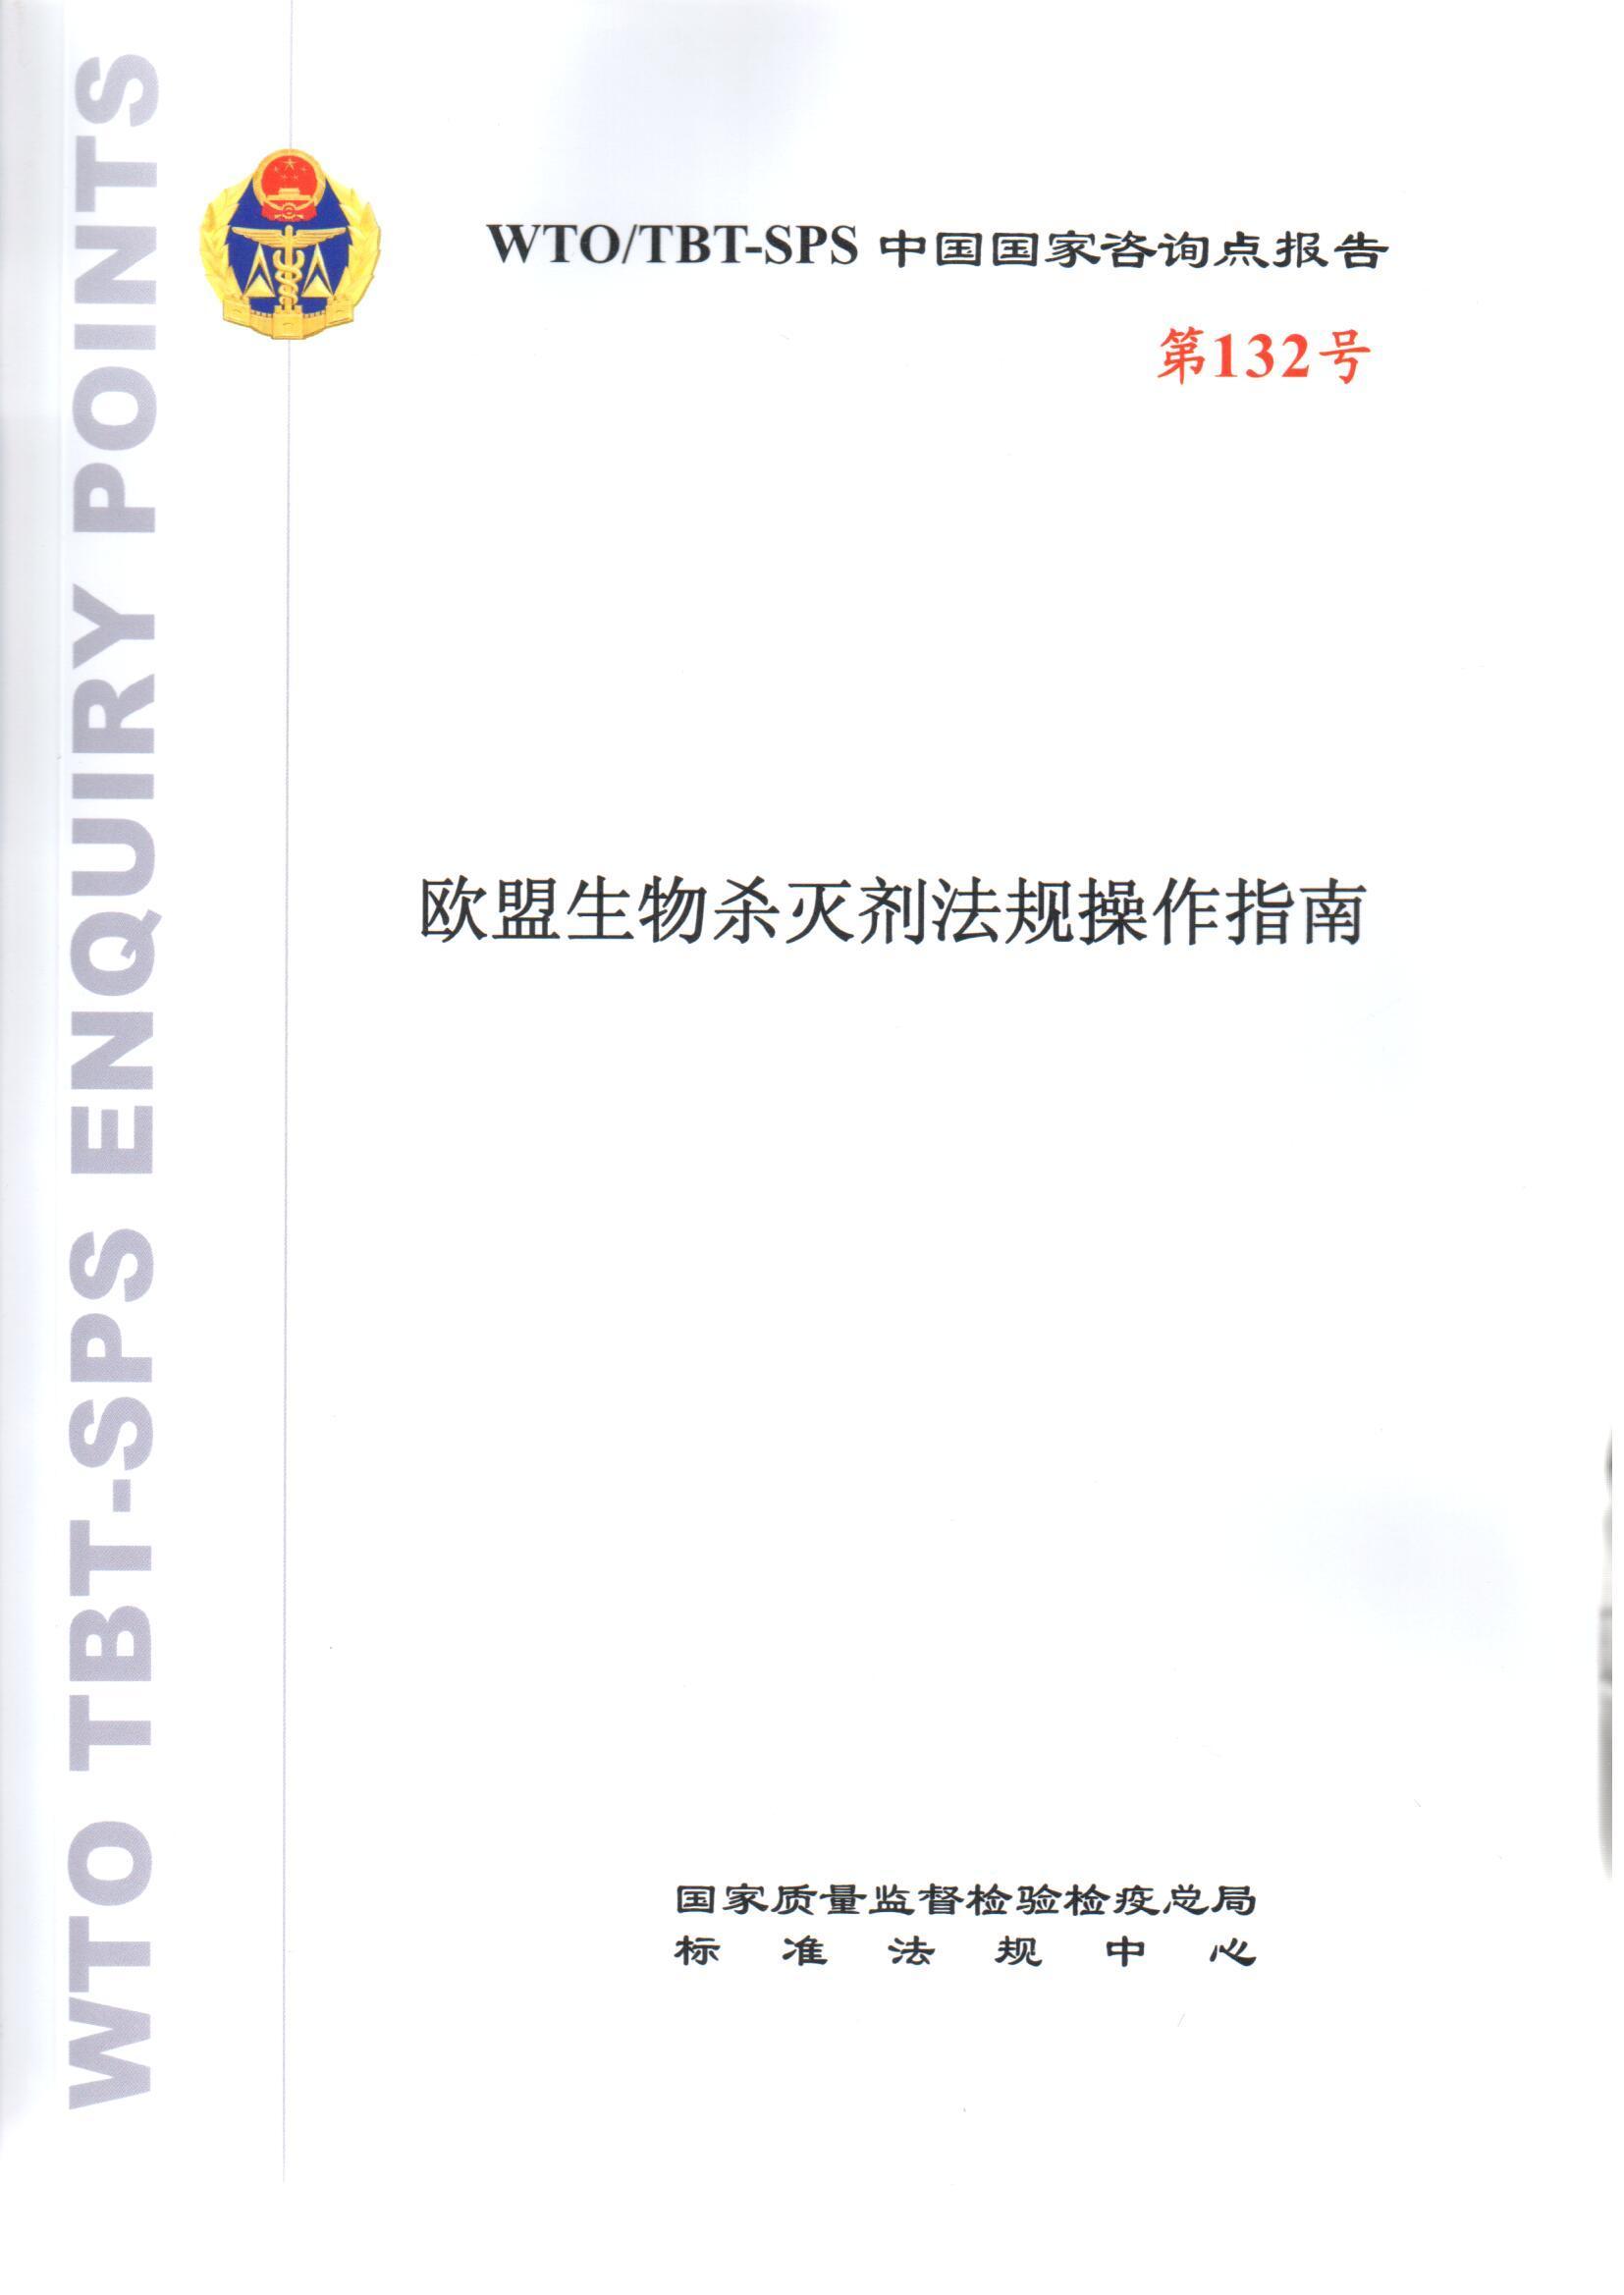 WTO/TBT-SPS 中国国家咨询点报告(第132号)——欧盟生物杀灭剂法规操作指南